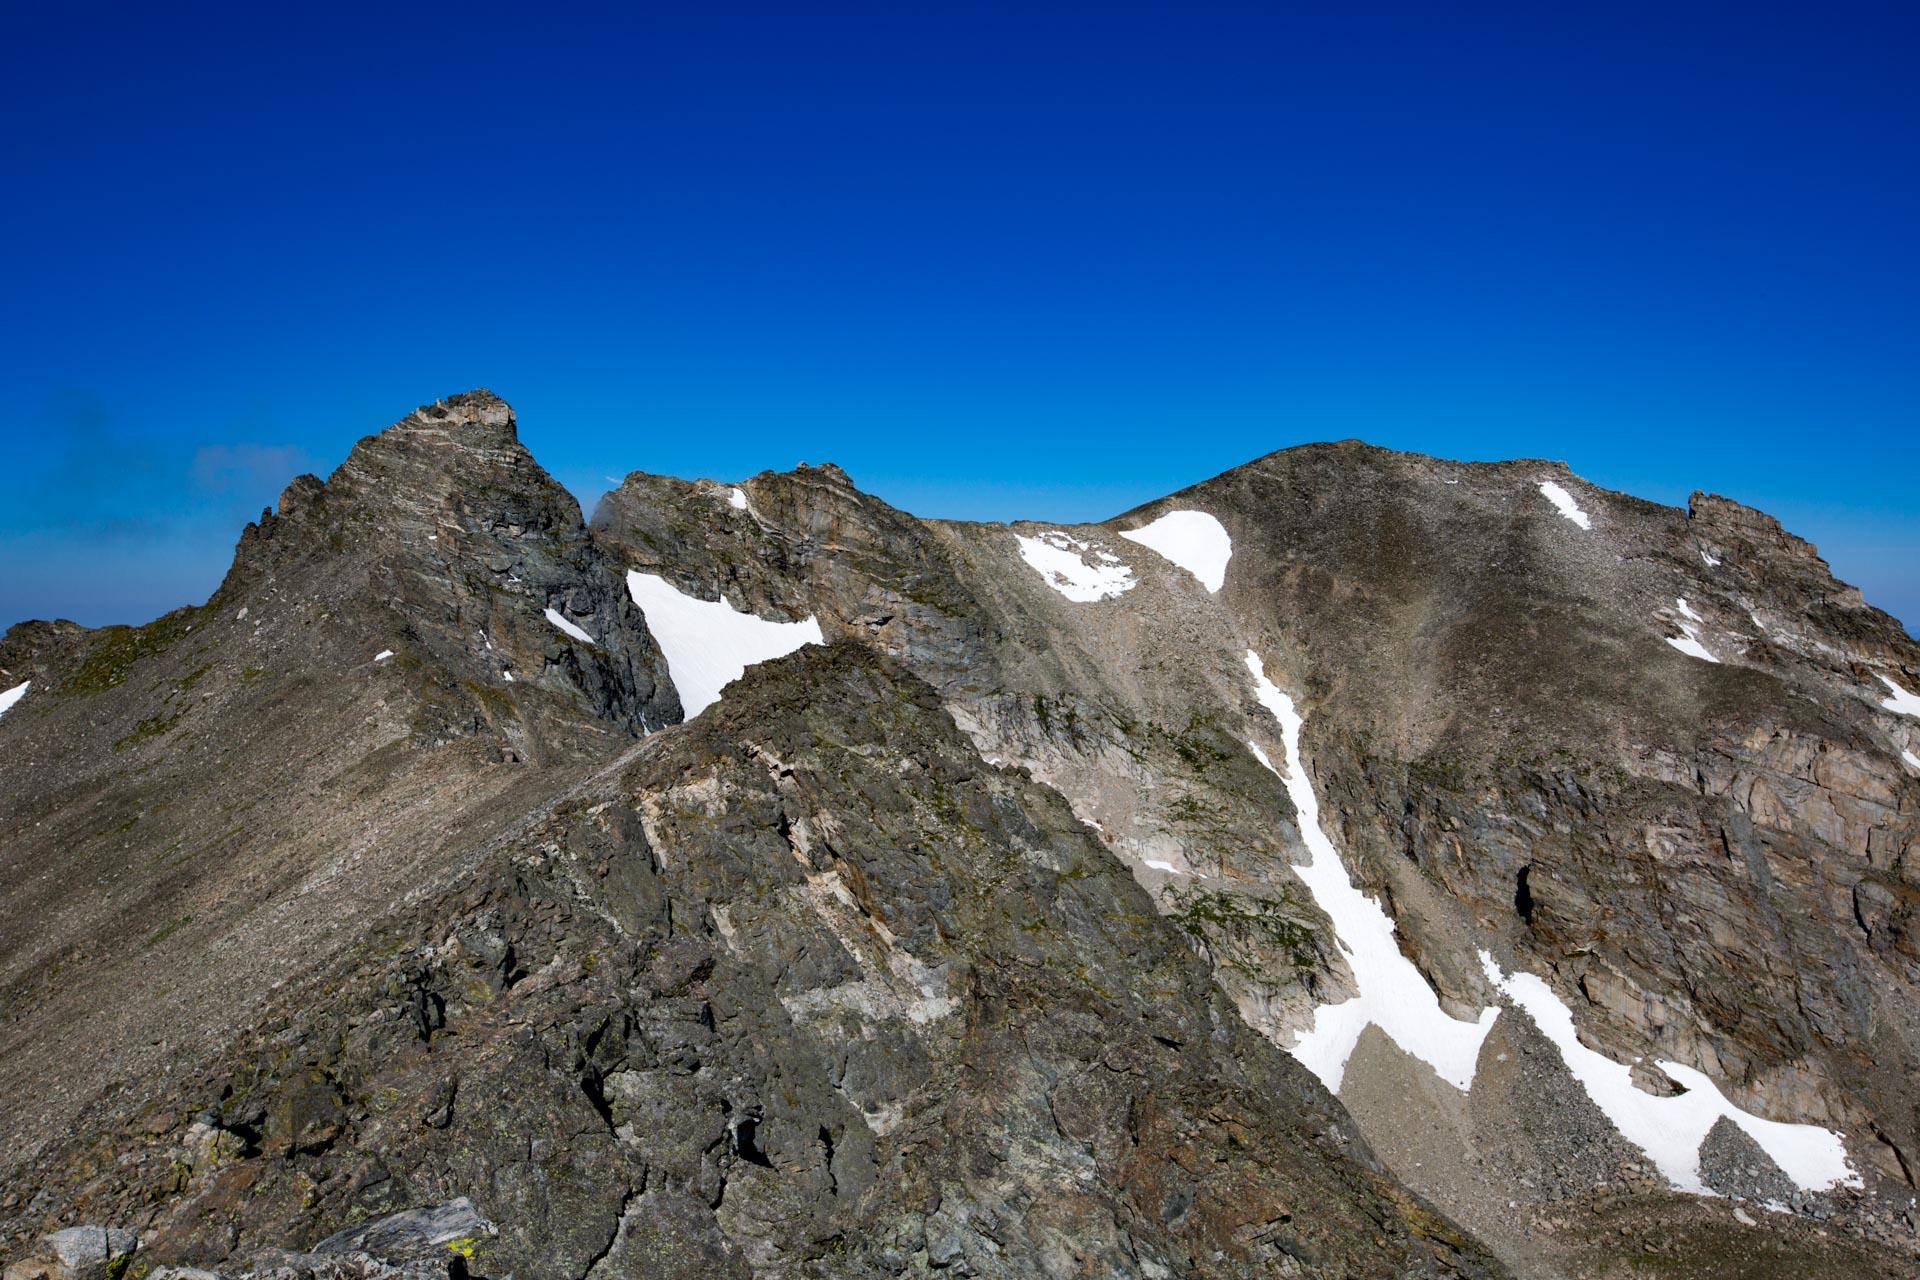 Navajo and Apache Peaks